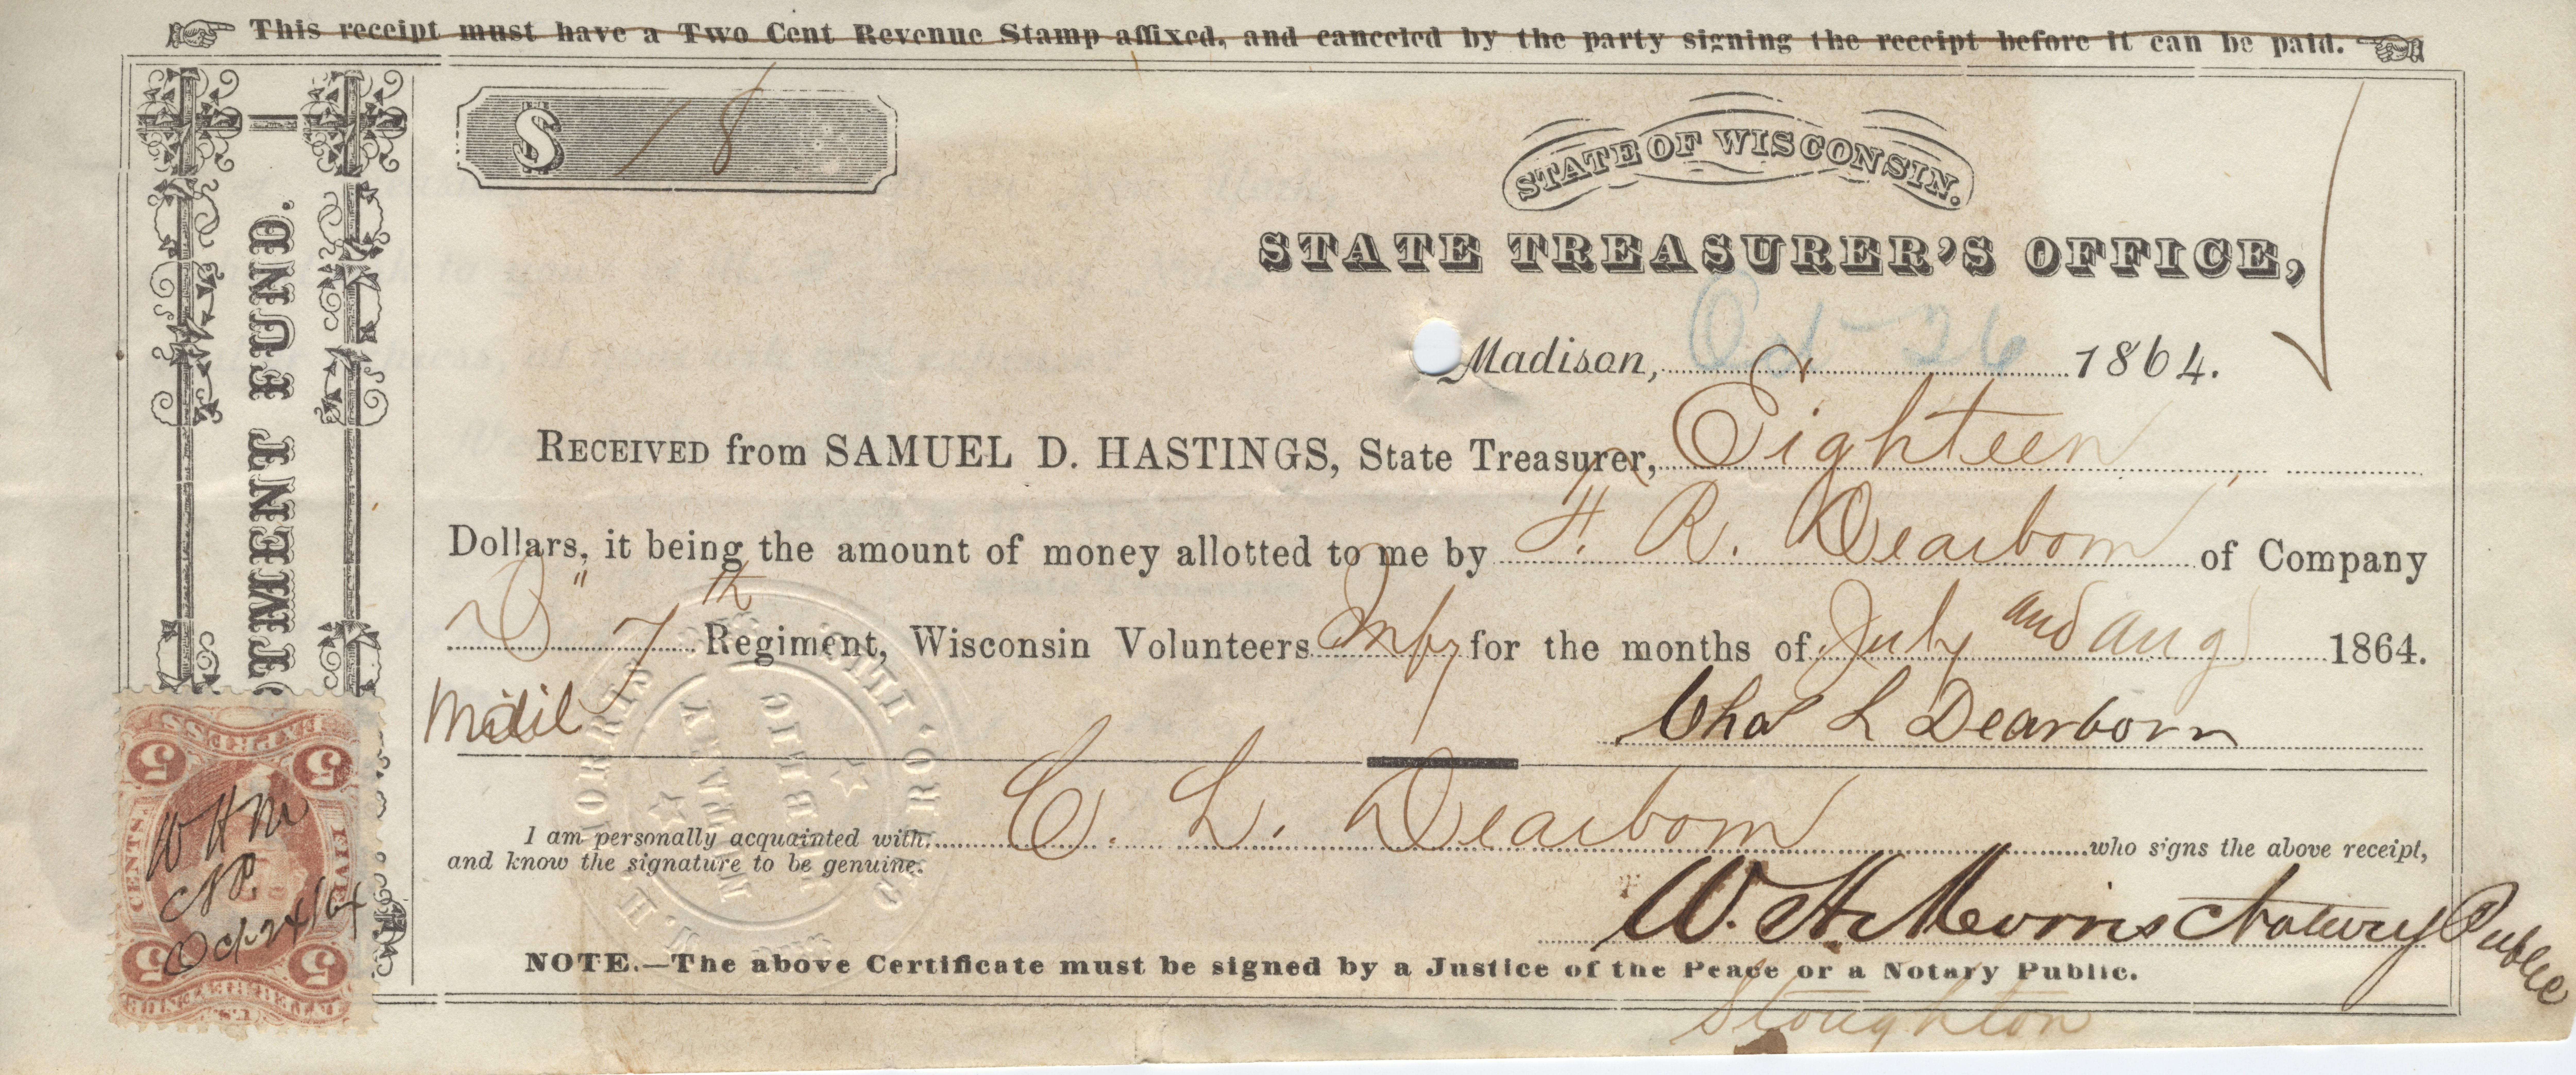 7th Wisconsin Regiment Pay Slip -